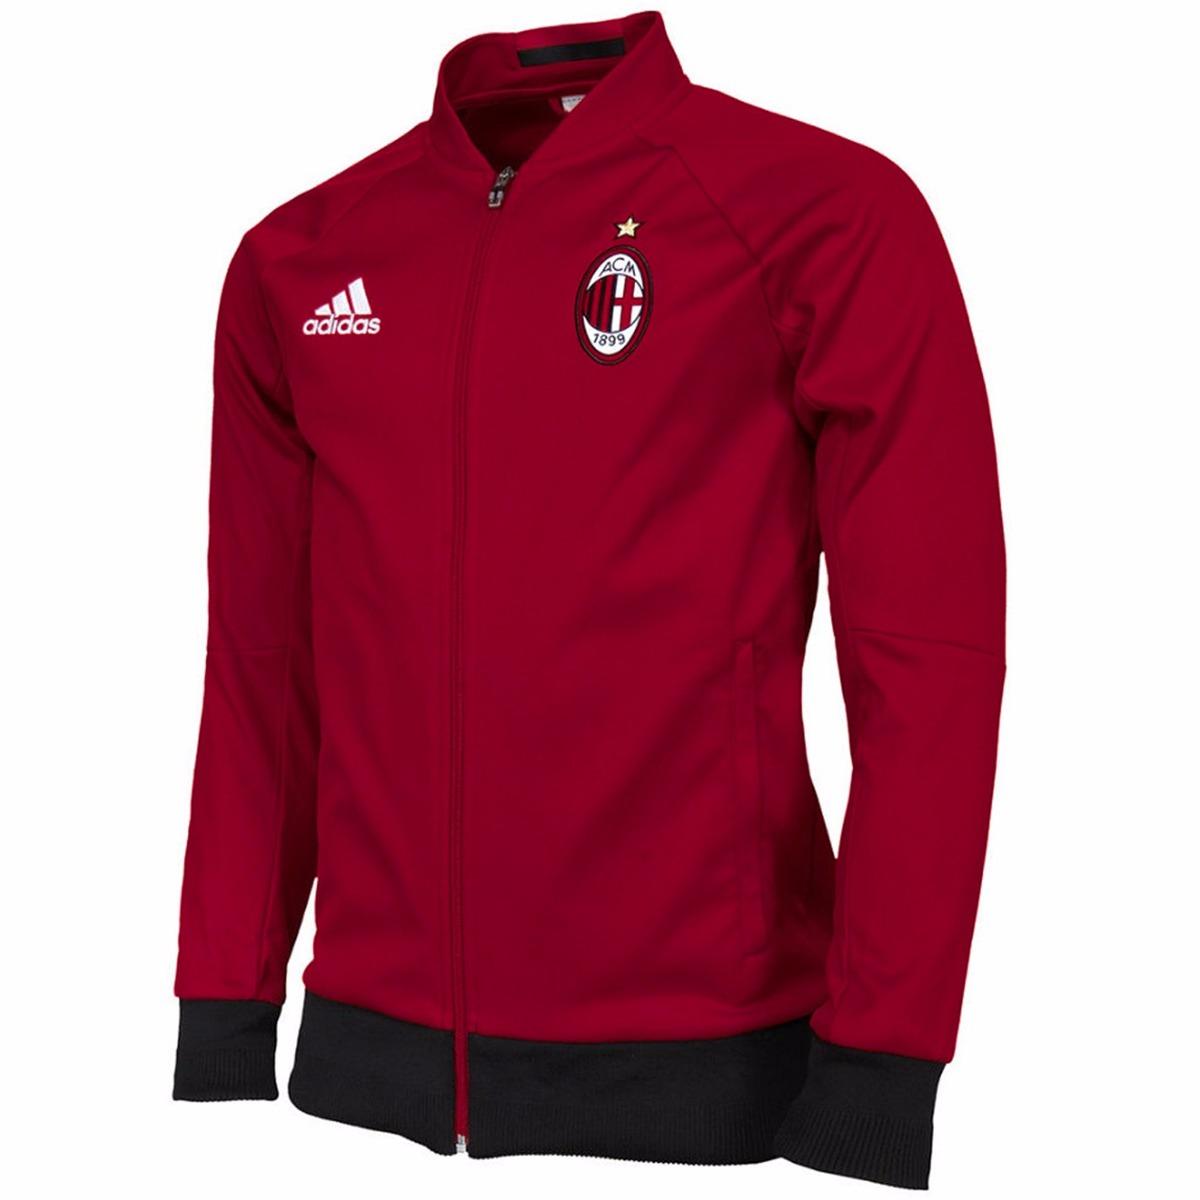 Atletica Sudadera En 00 Anthem 799 Hombre Ap1529 Adidas Milan OxxnZw